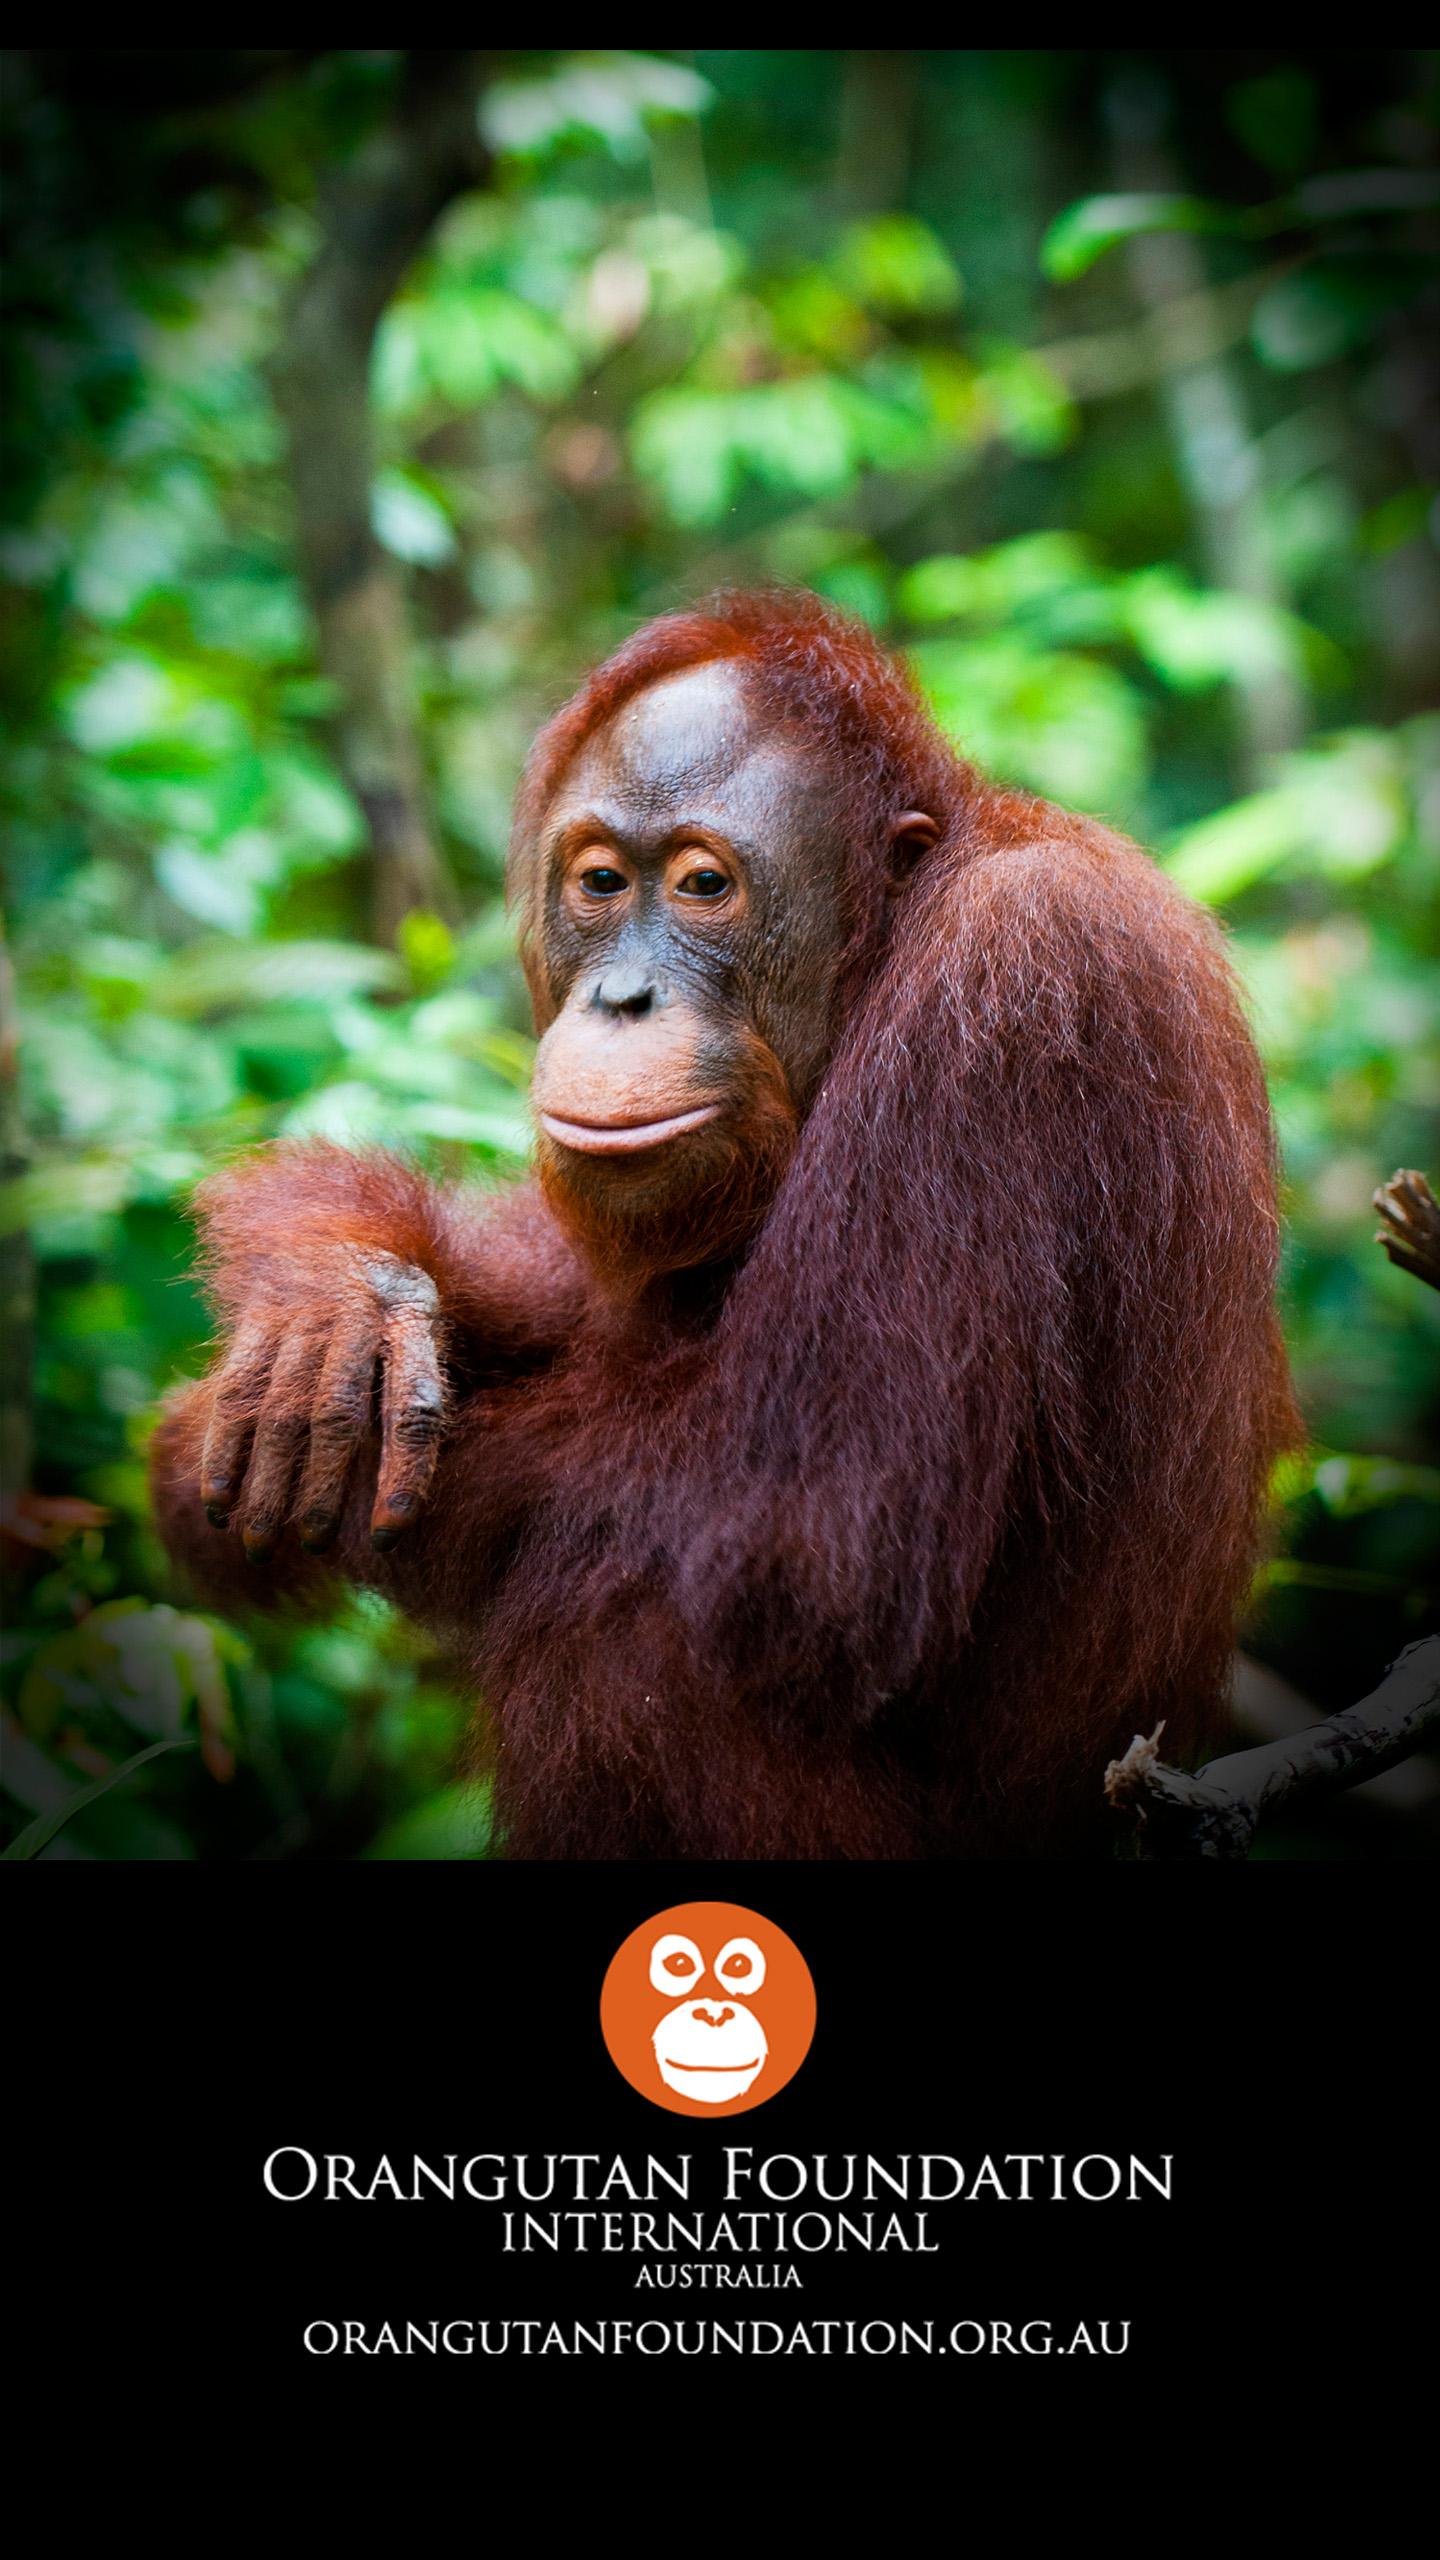 Wallpapers Orangutan Foundation International Australia